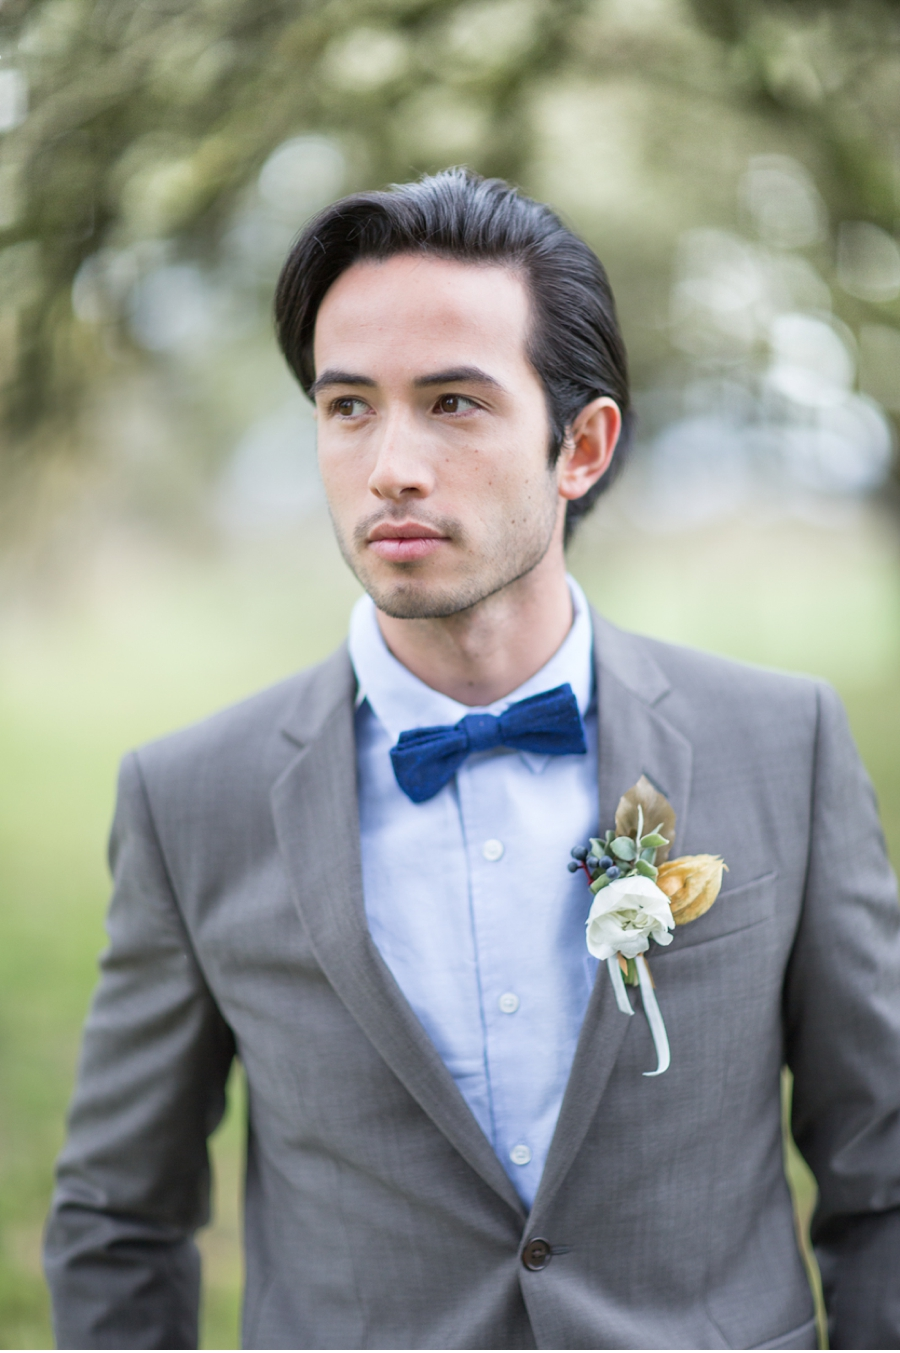 Groom-Style-Wedding-Attire